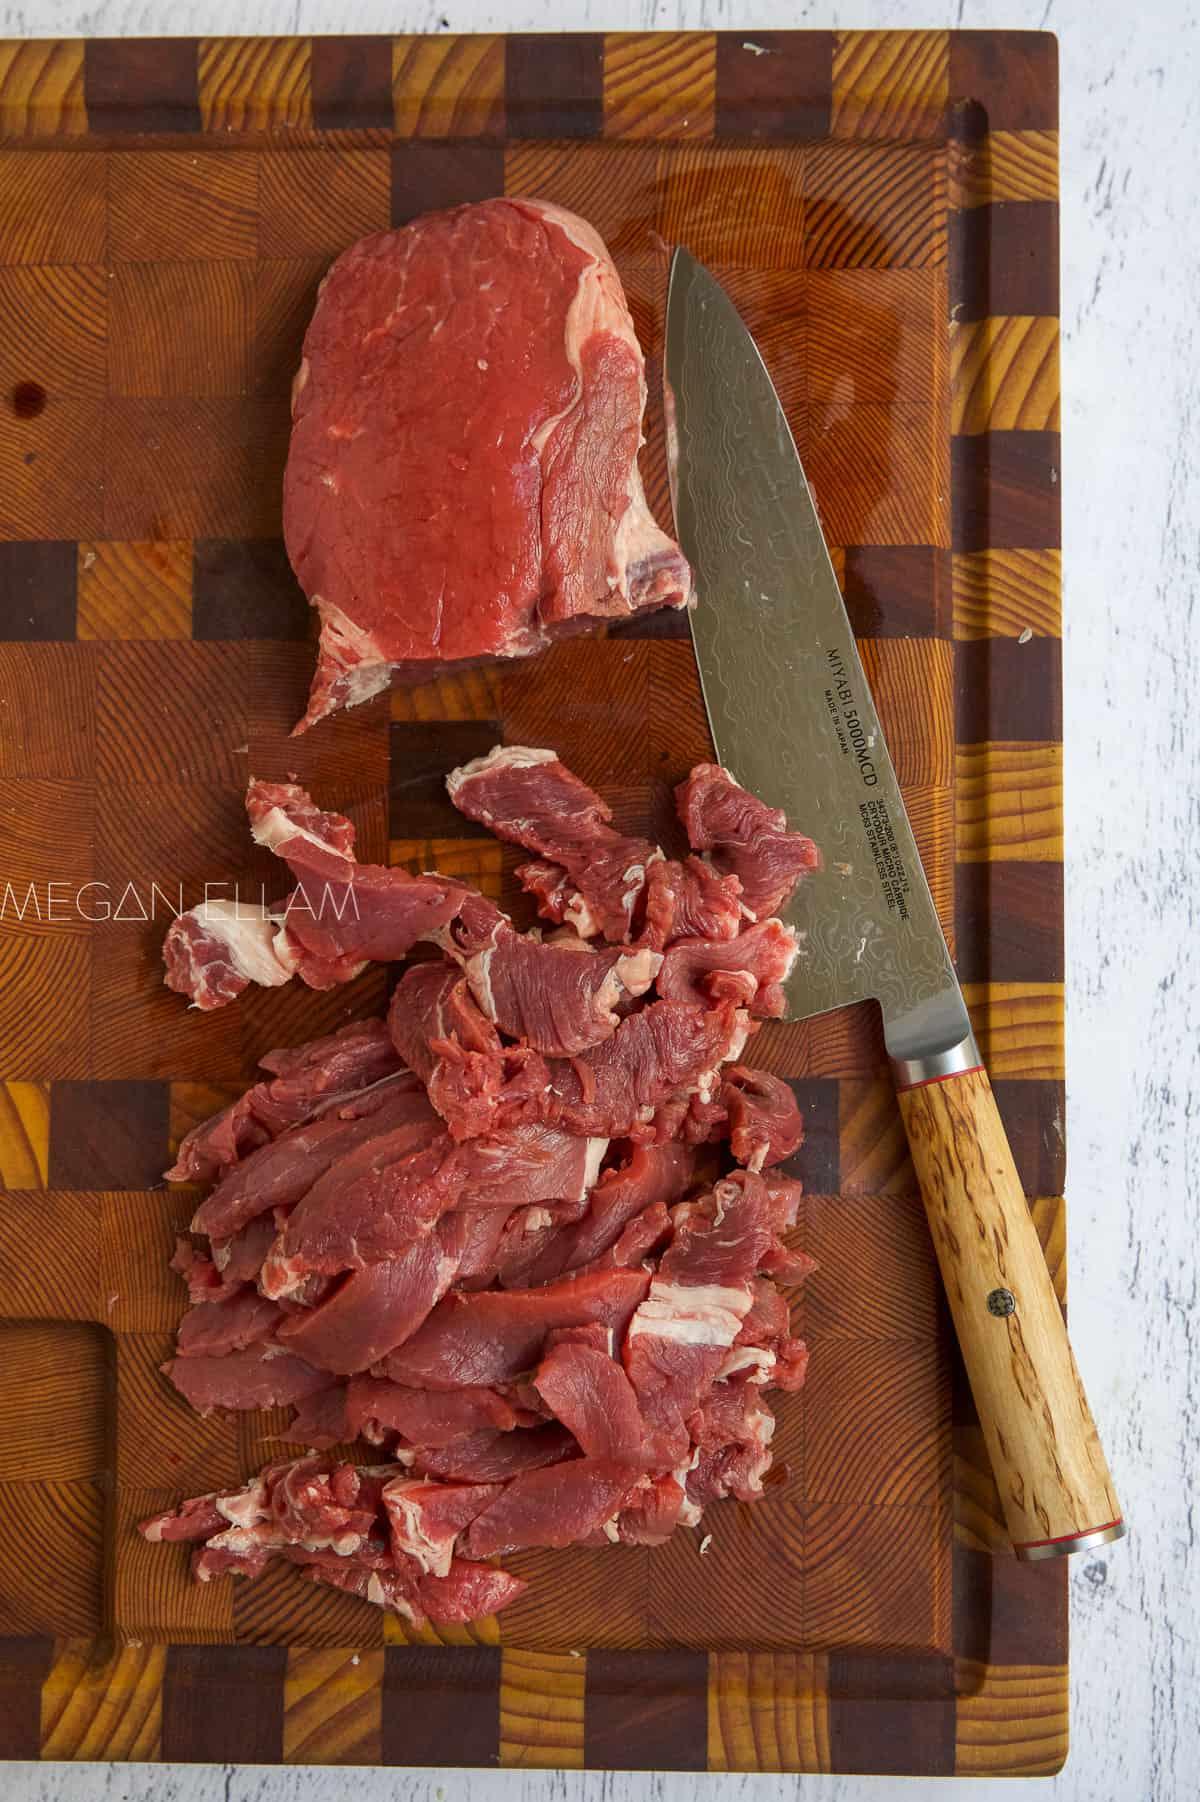 Sliced Beef on a cutting board.